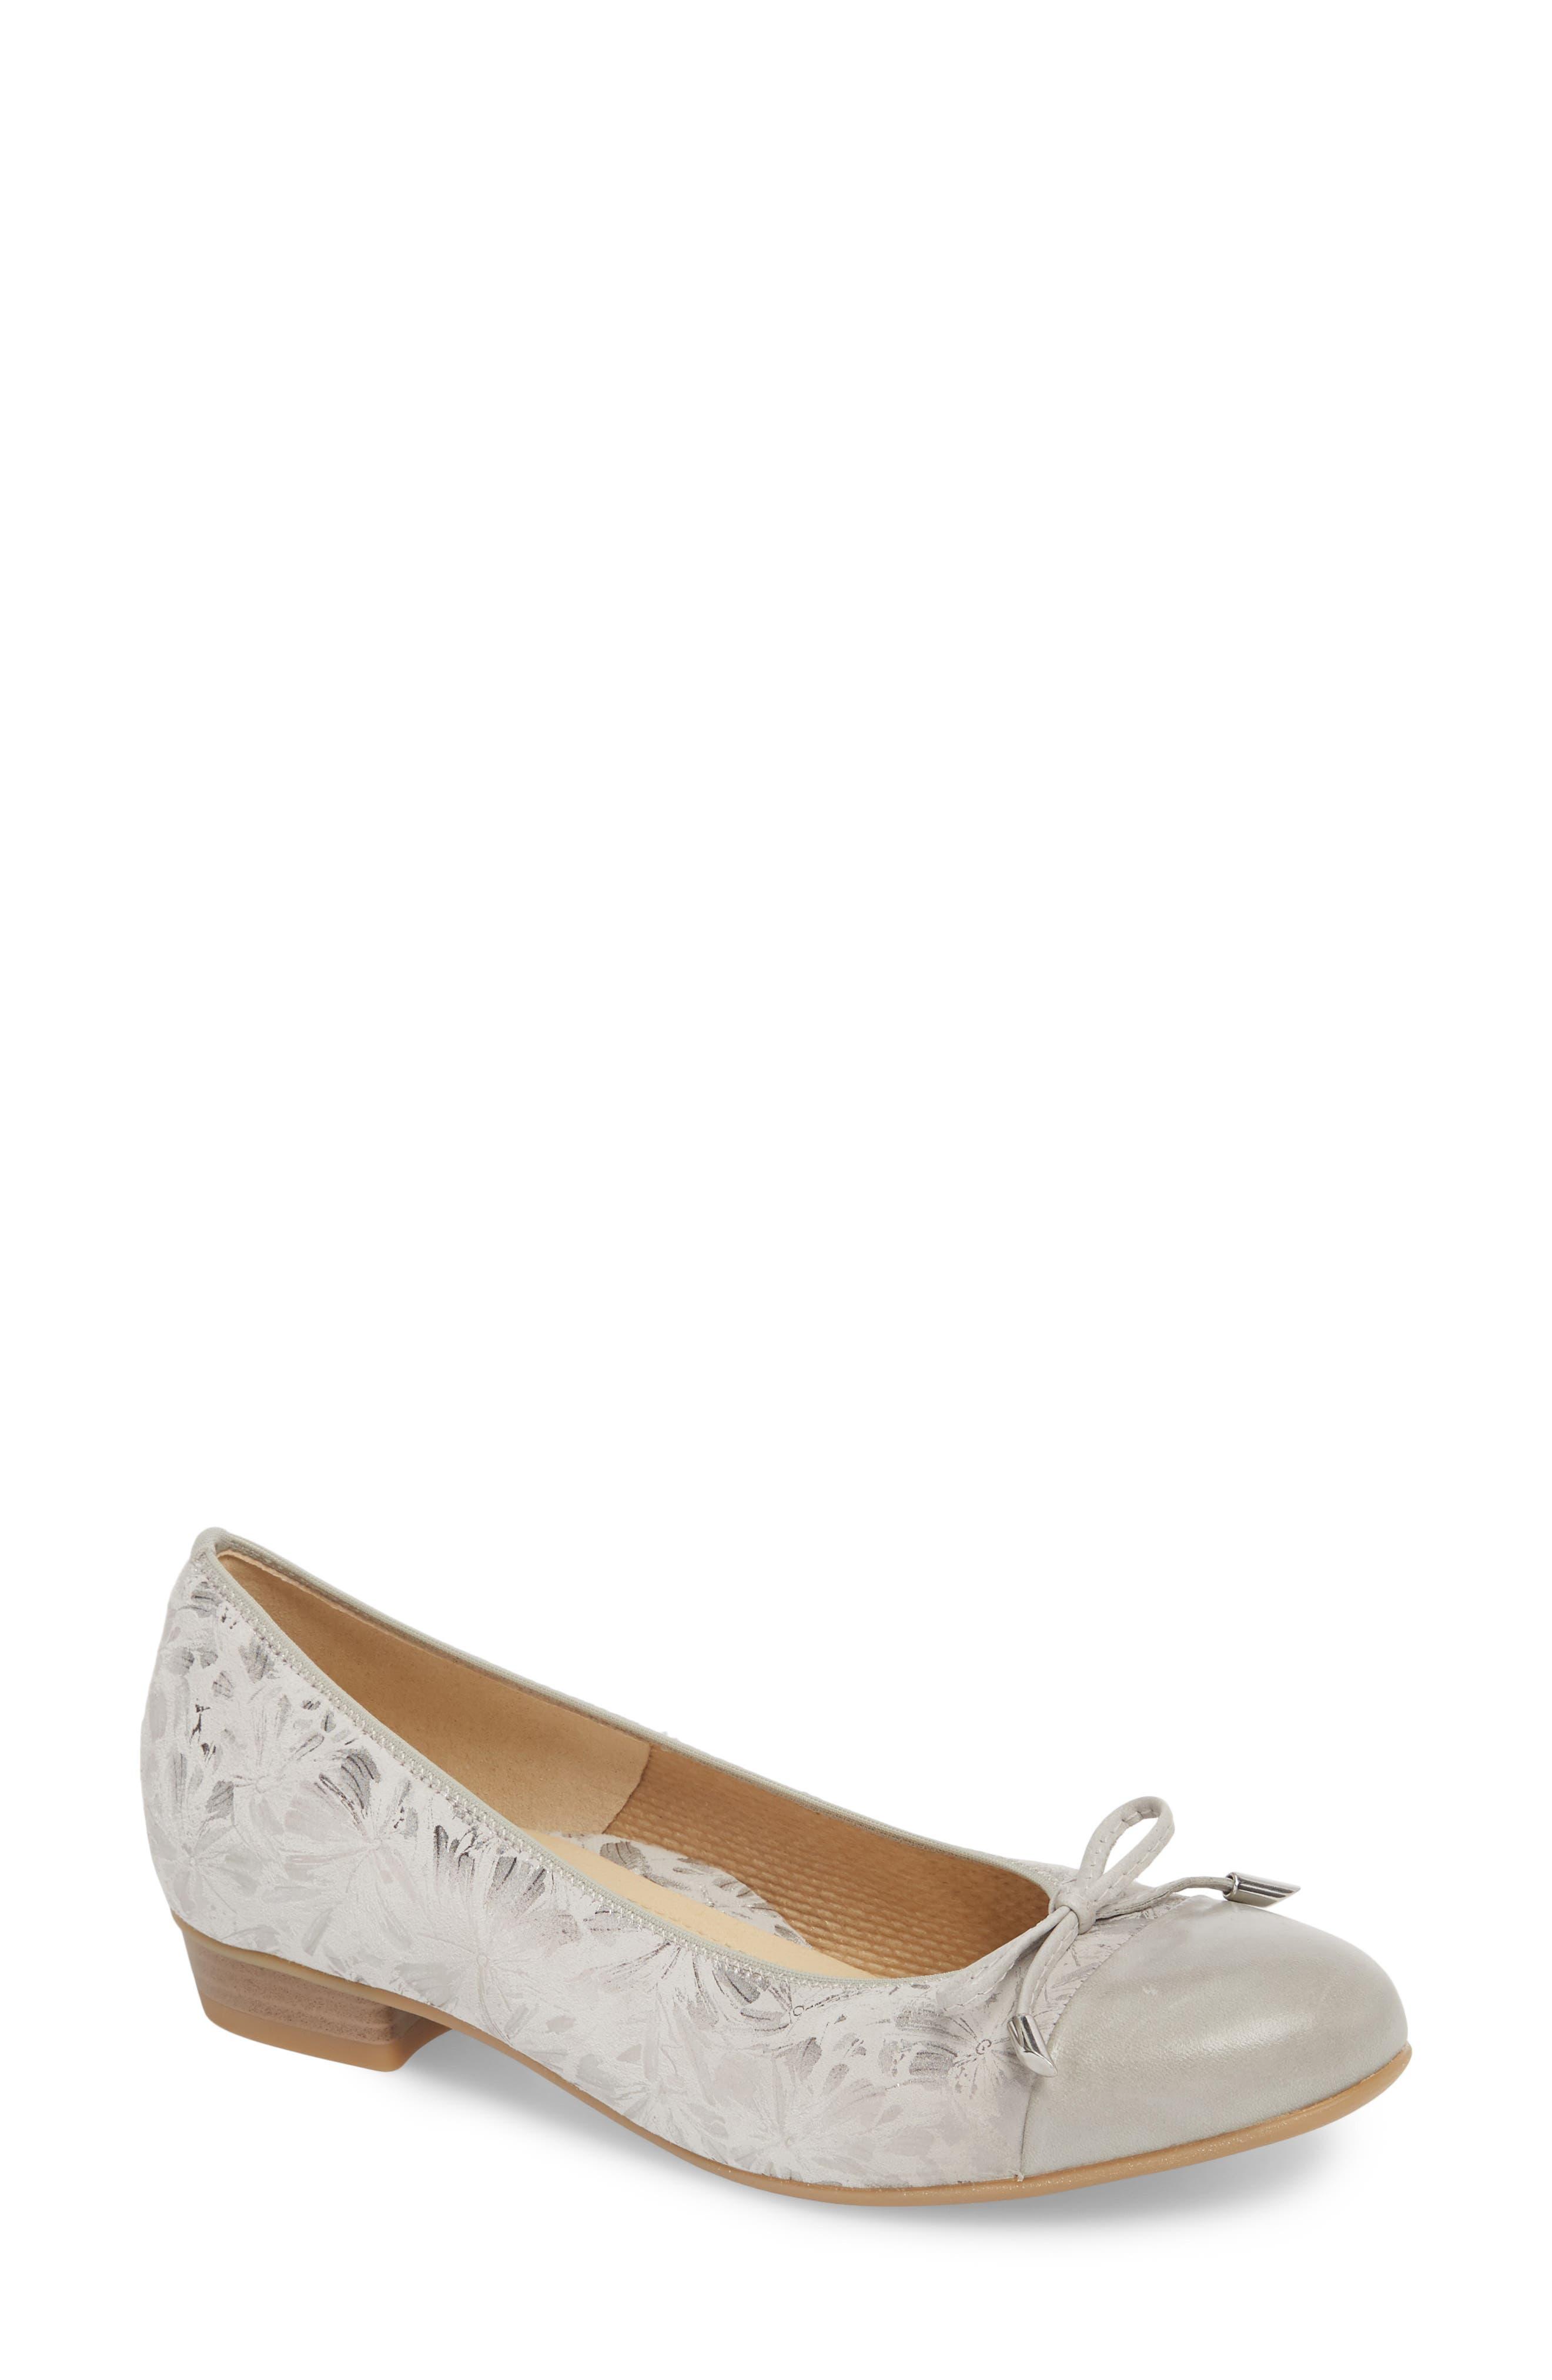 Ballet Flats Ballerina Shoes for Women On Sale, Natural, Fur, 2017, 3.5 Francesco Russo